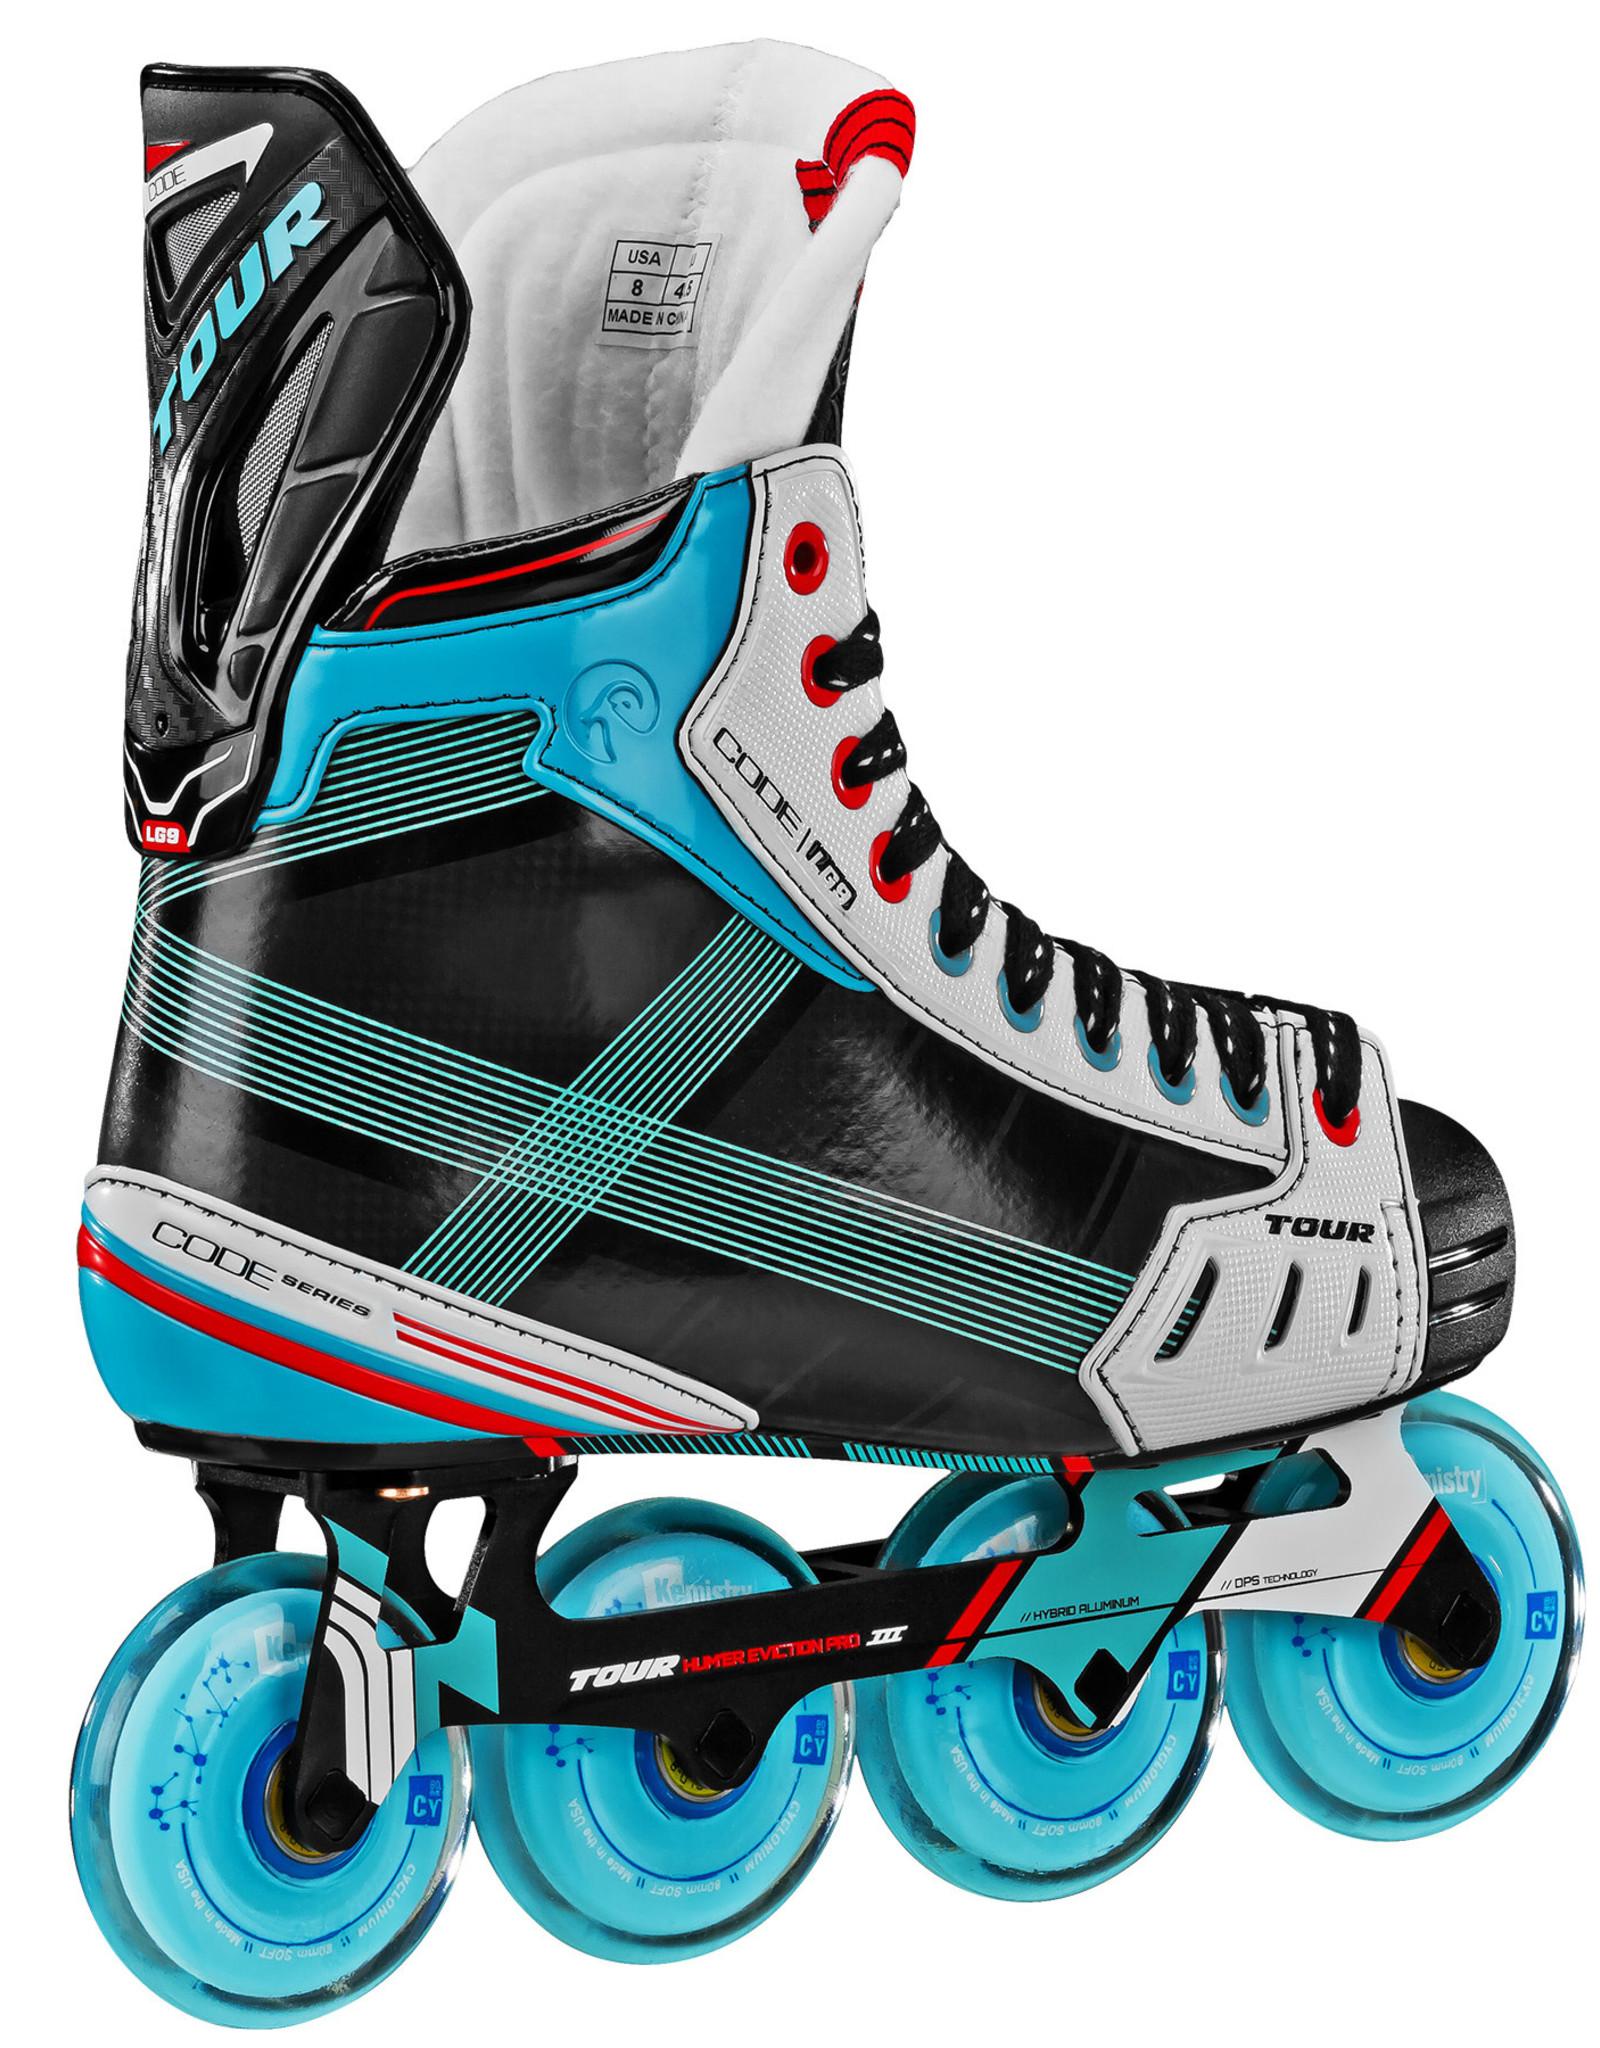 Tour Tour Code LG9 Inline Skate